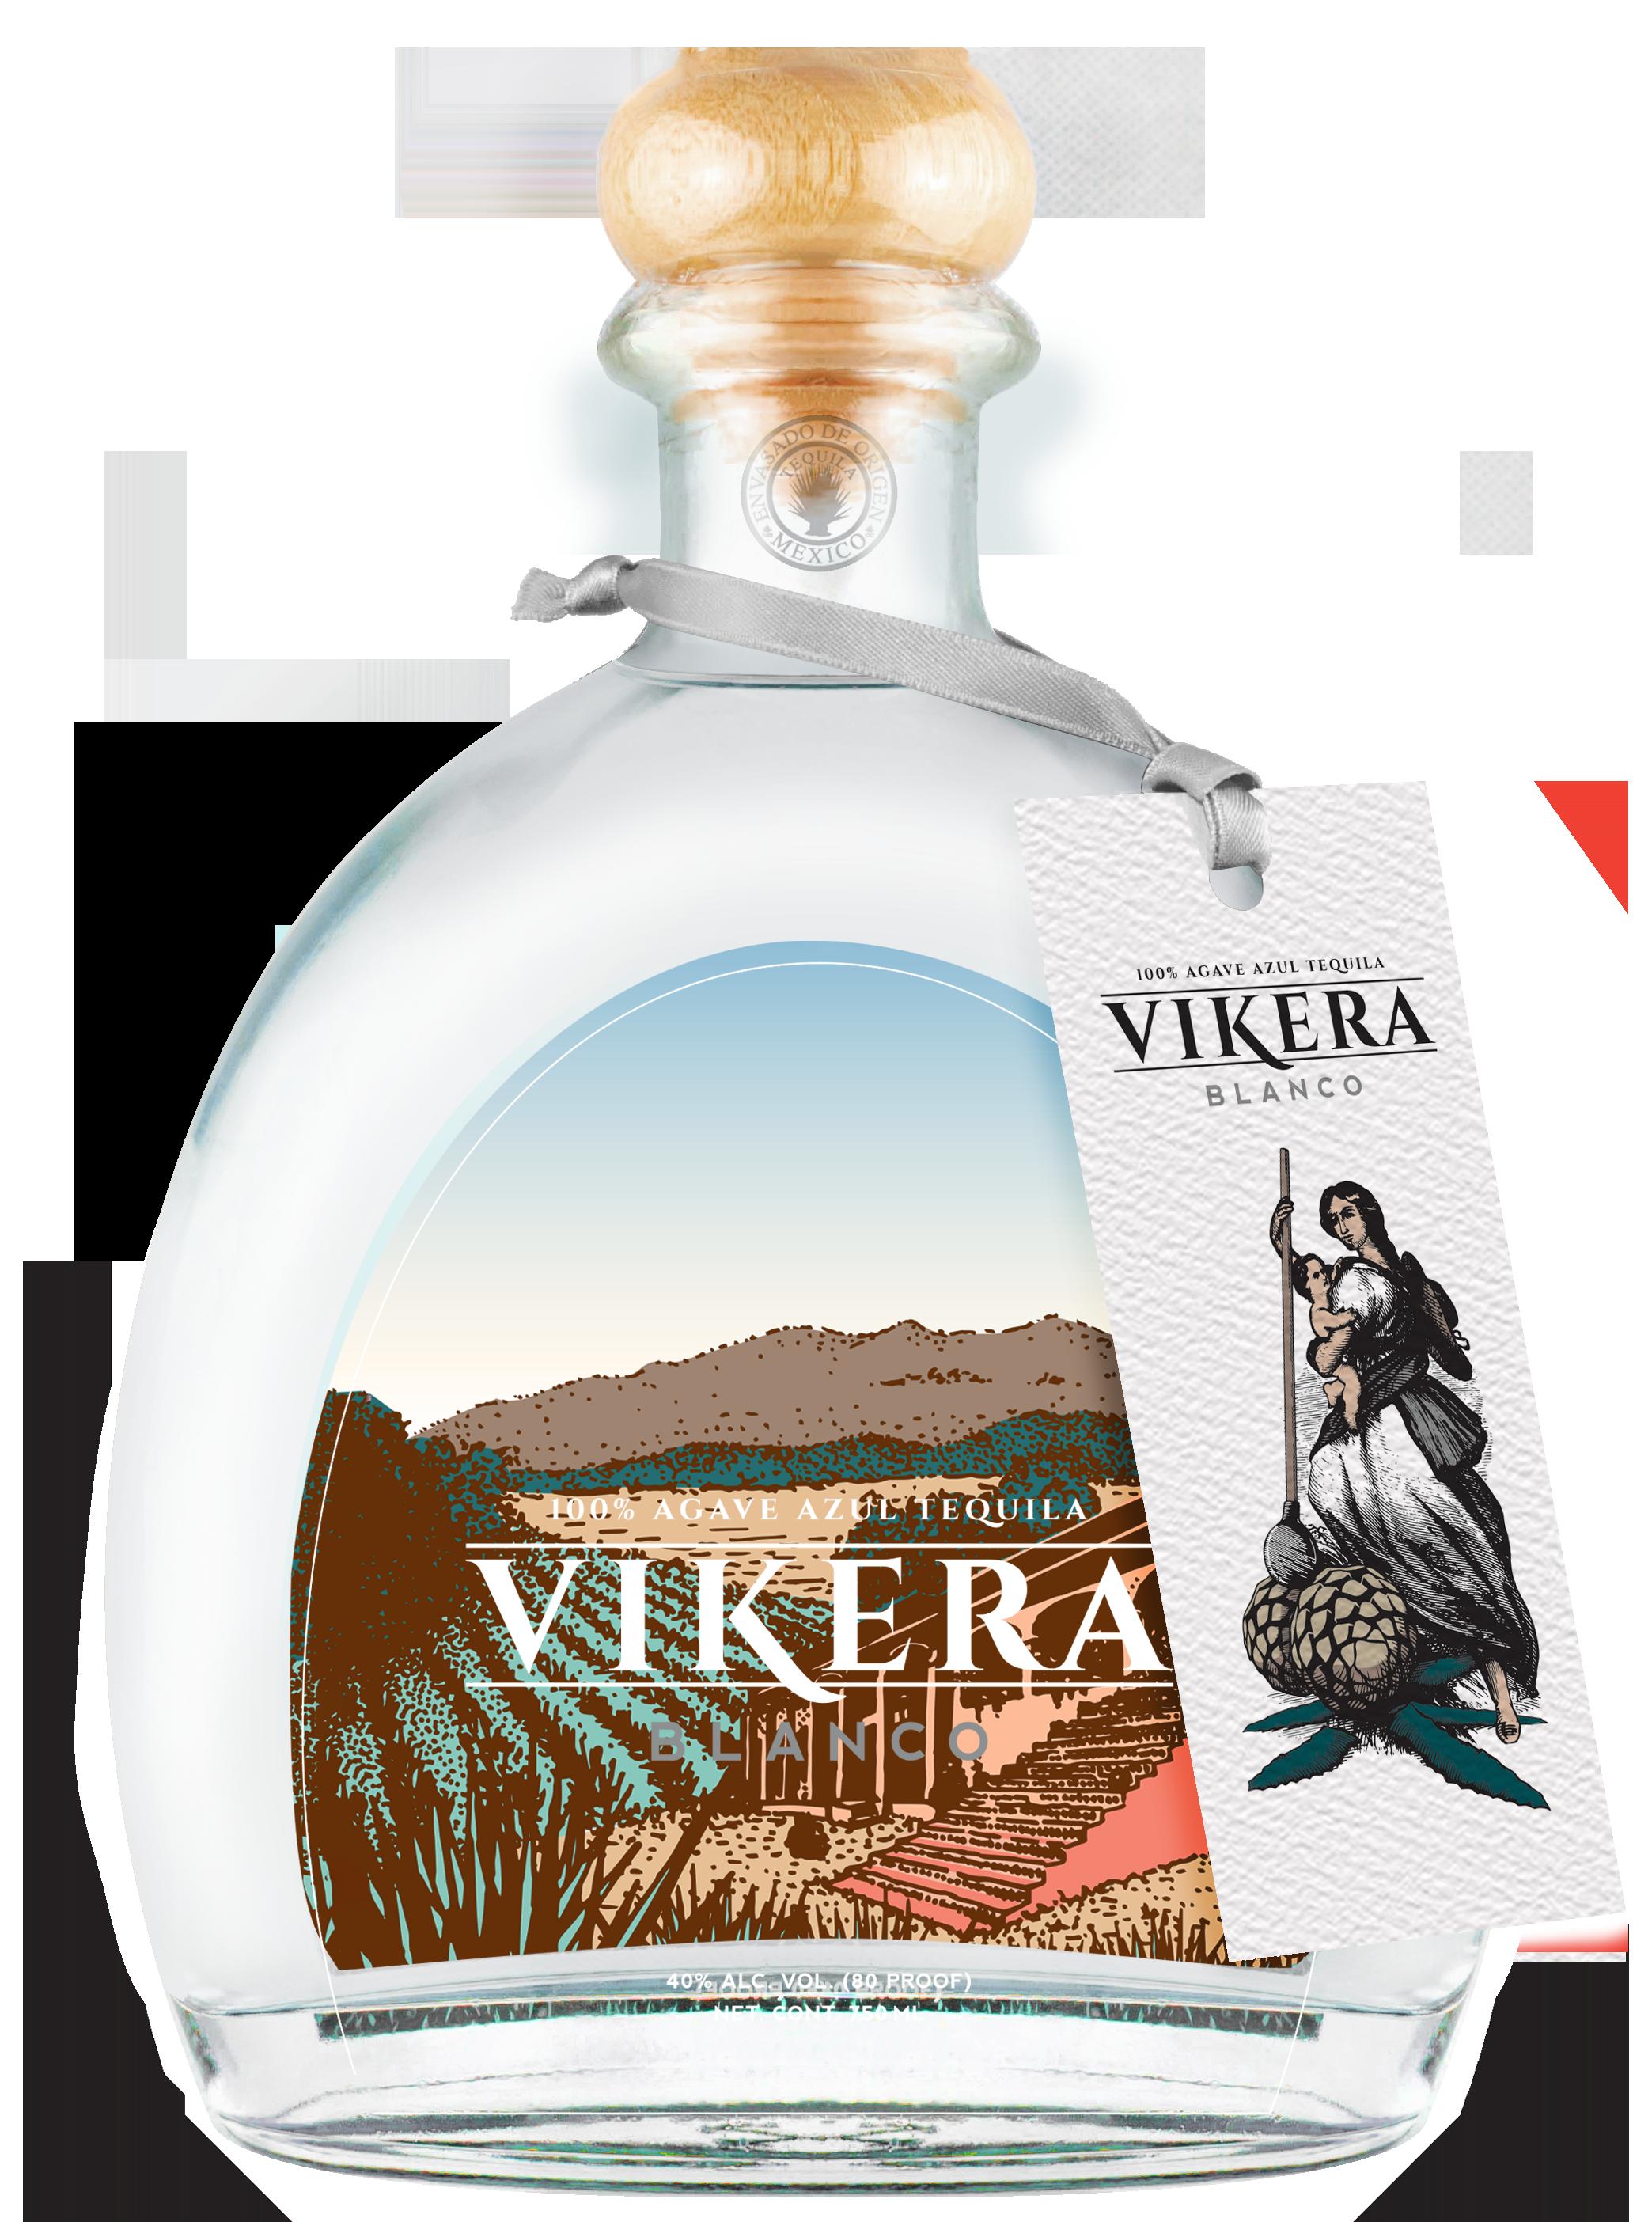 Vikera-Bottle-Blanco-02.png